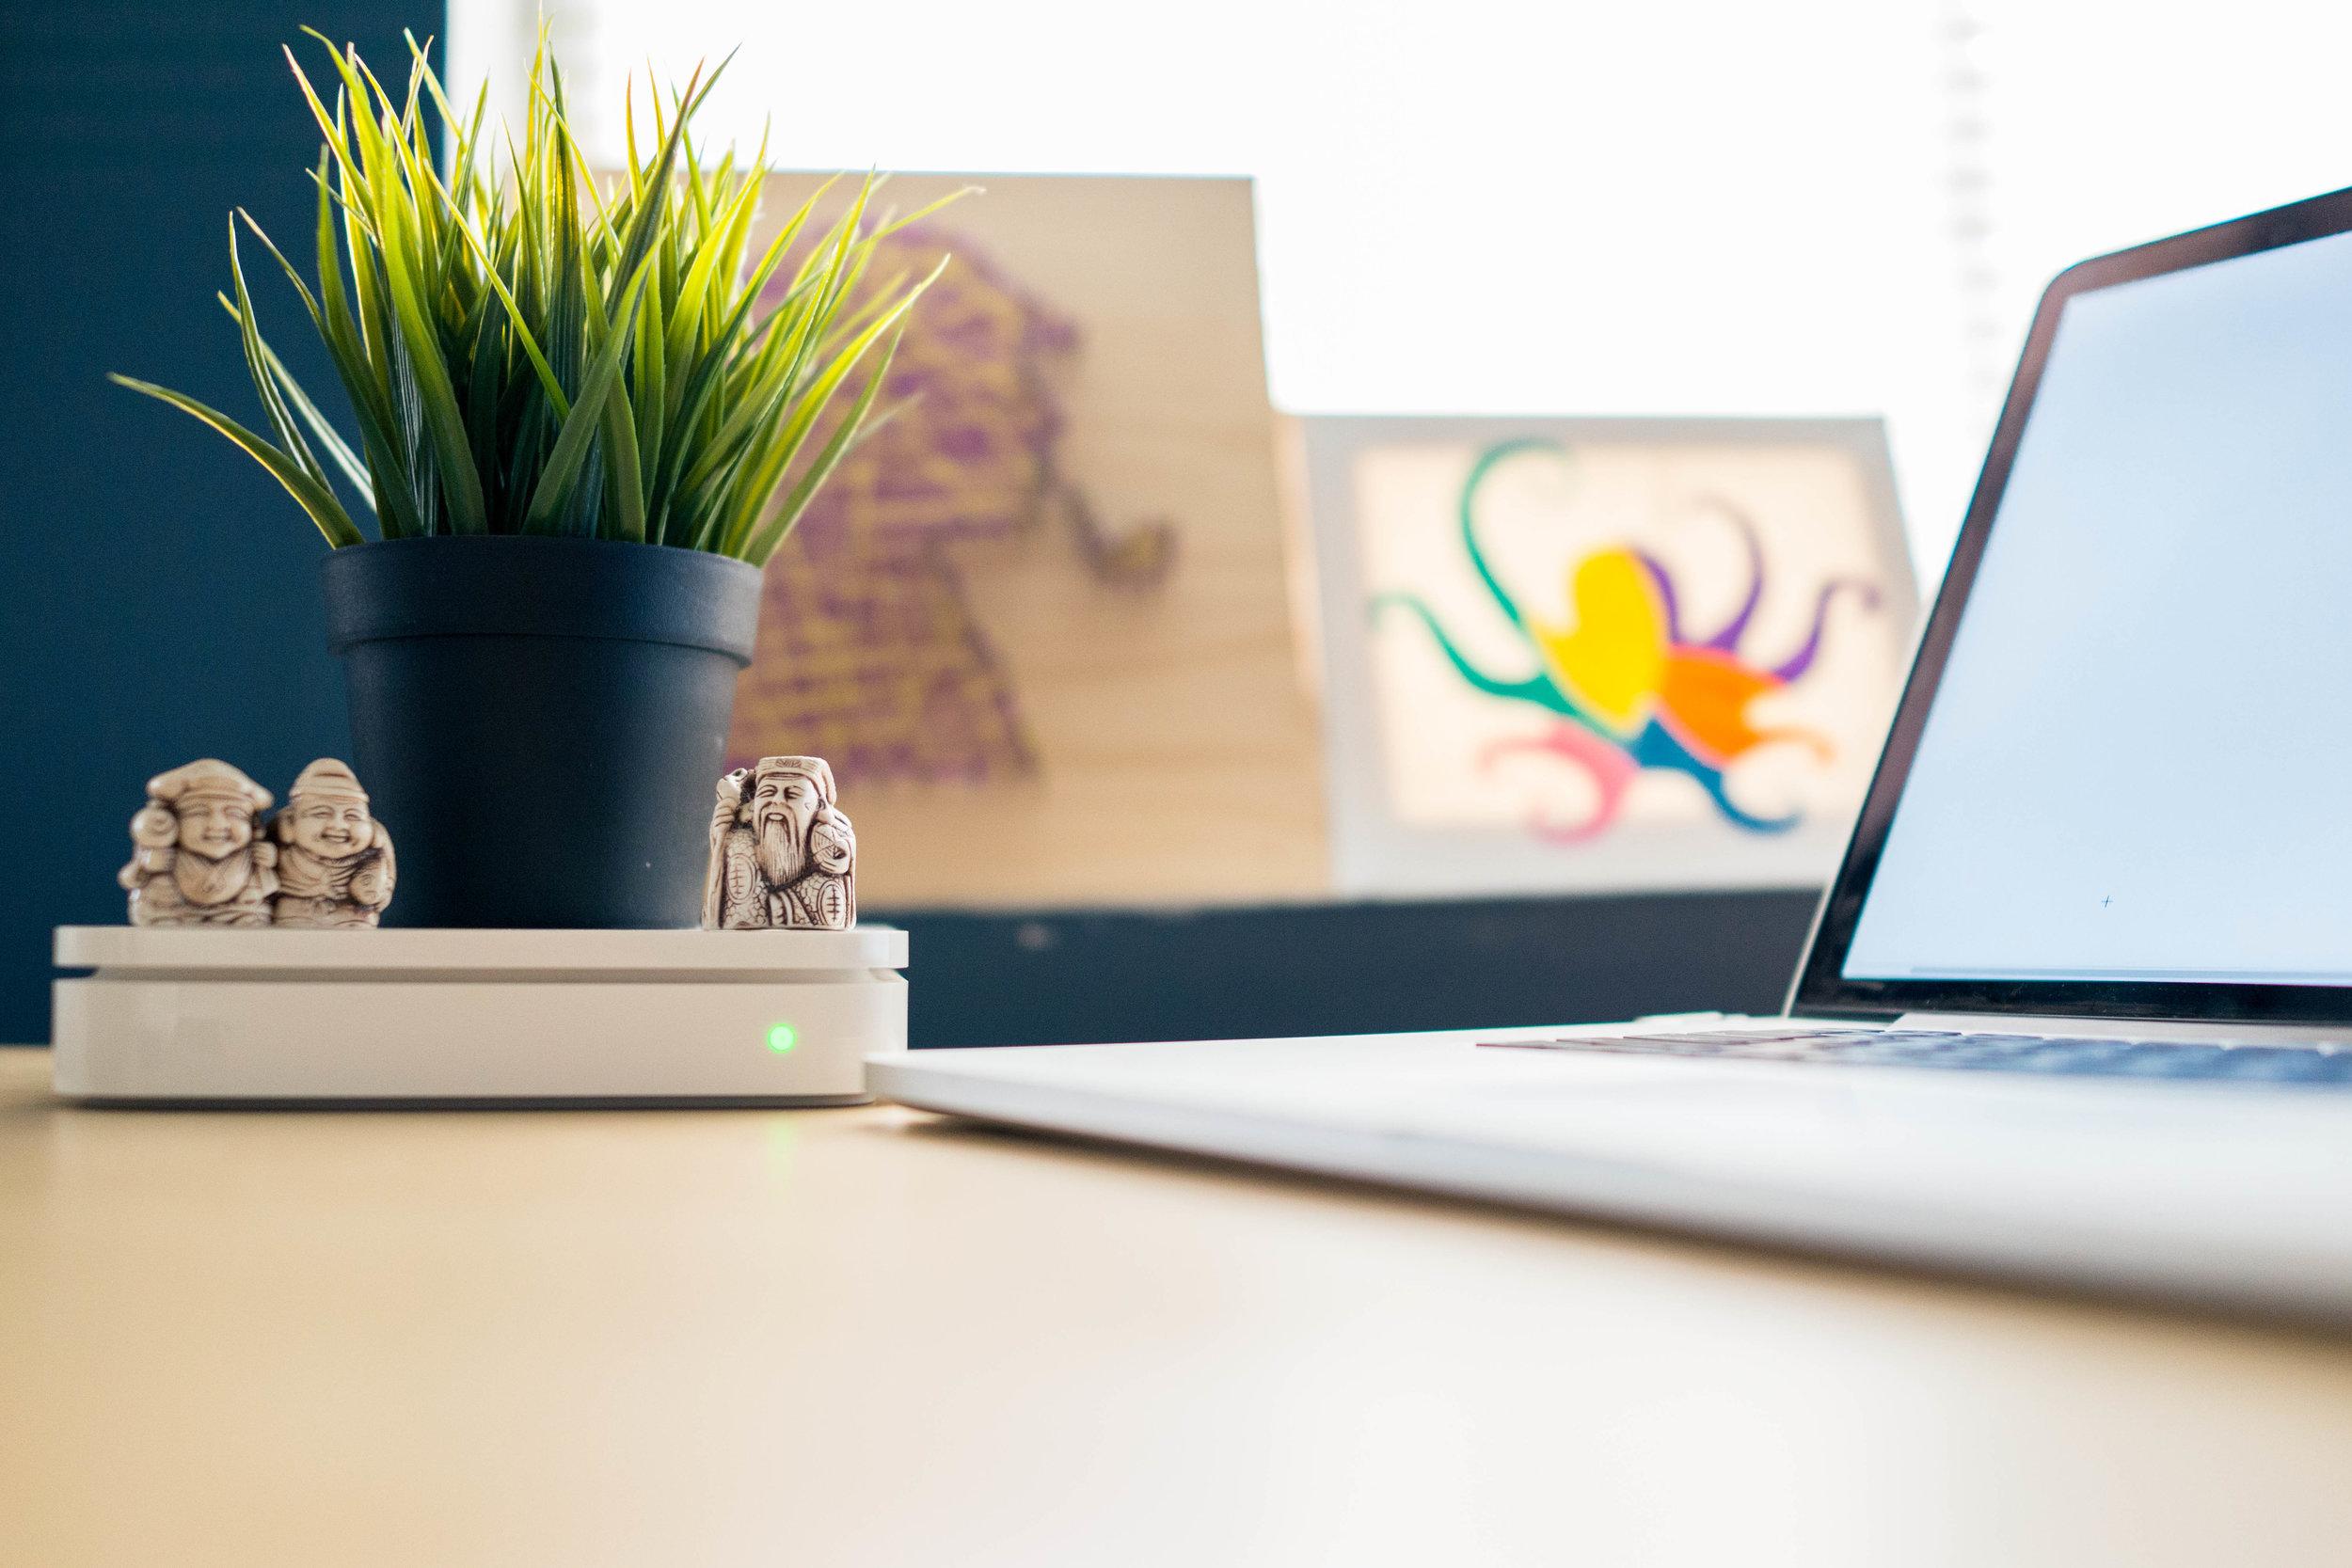 Desk-plant-pexels-photo-436784.jpeg